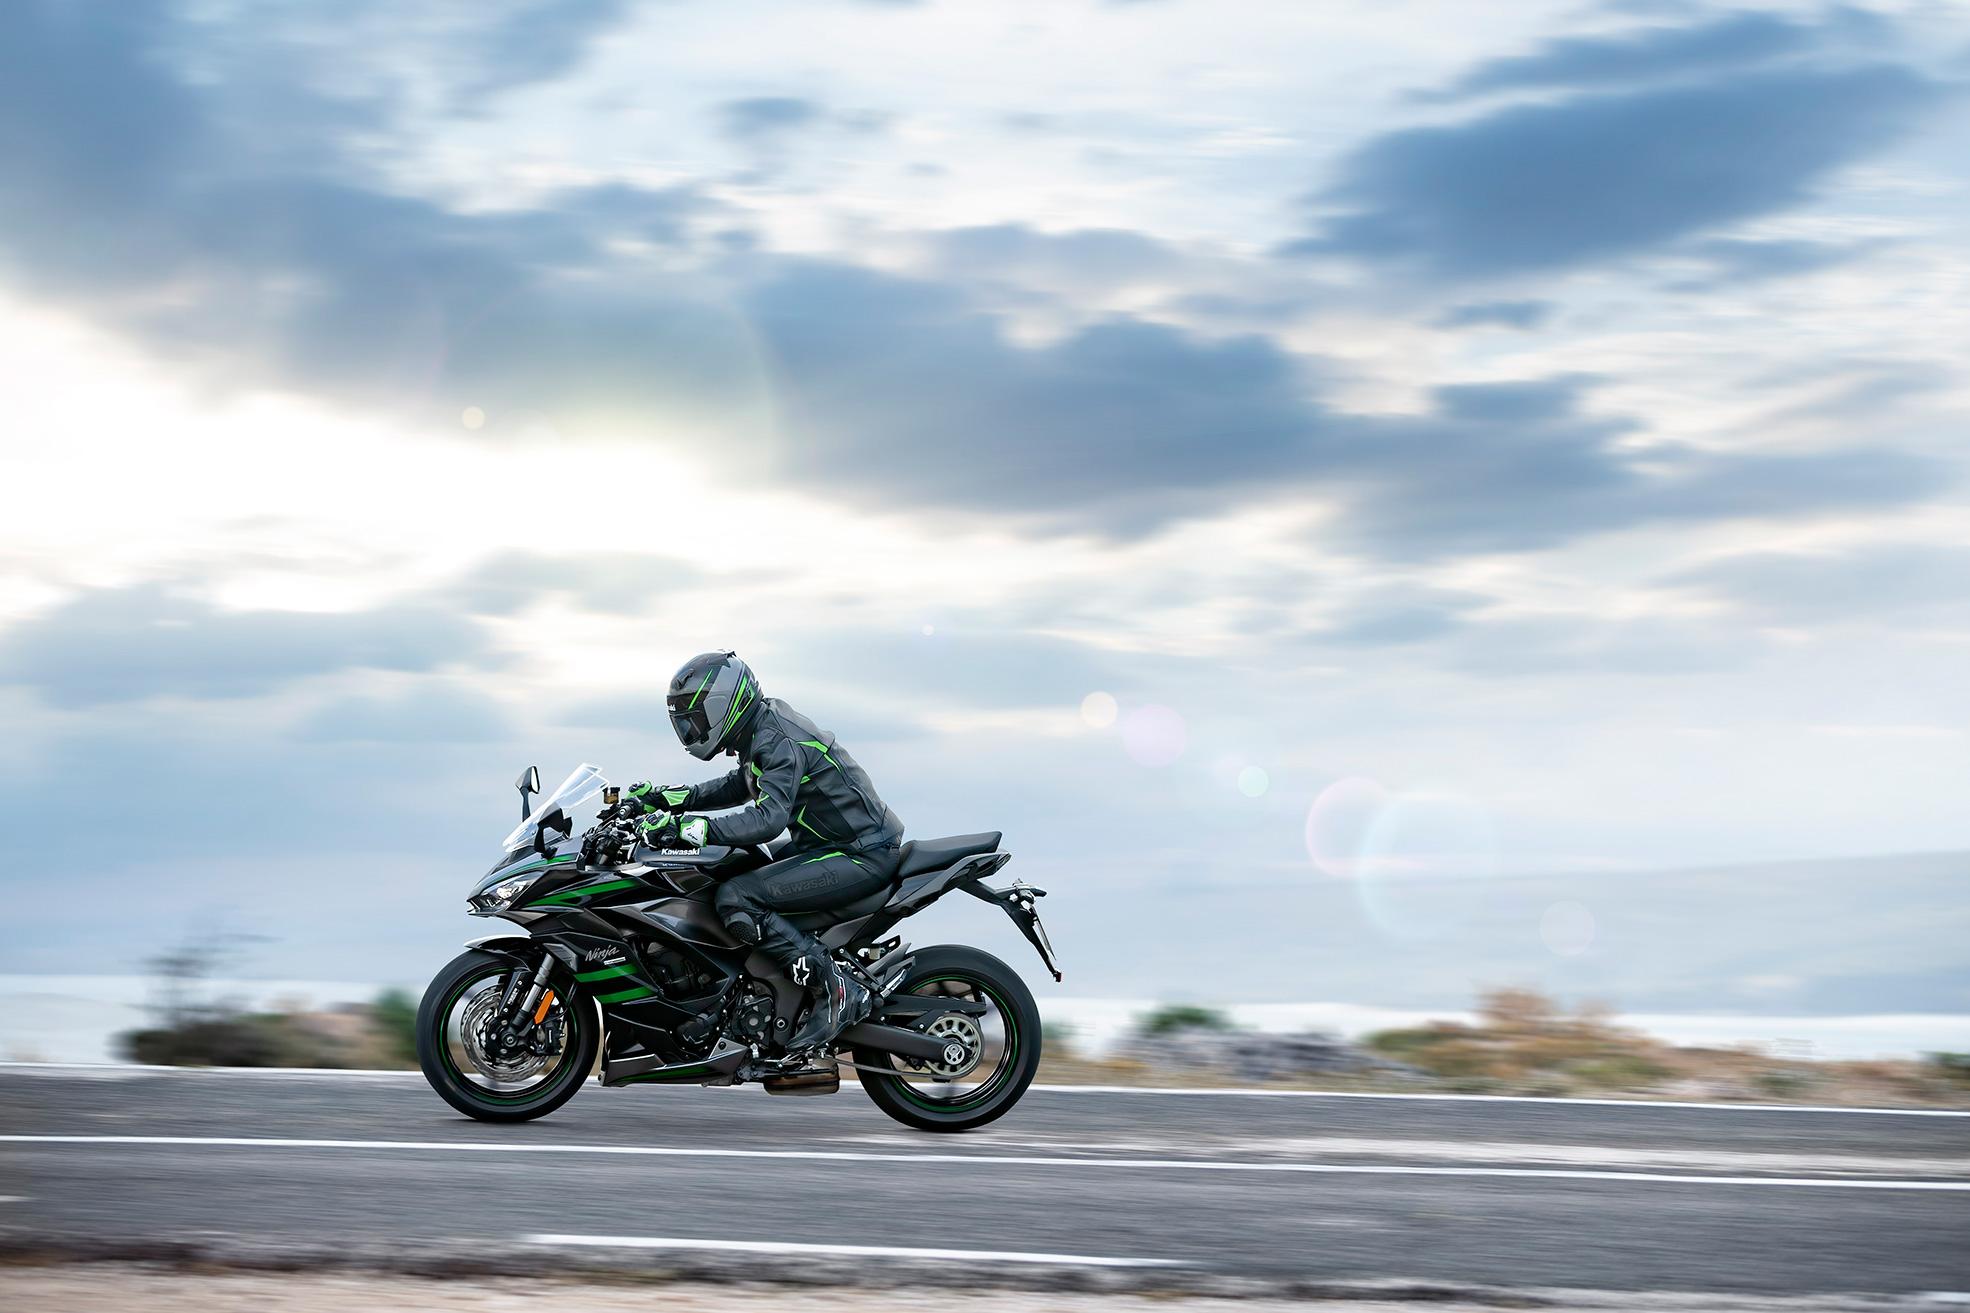 2020 Kawasaki Ninja 1000SX – Η Καλύτερη των Δύο Κόσμων